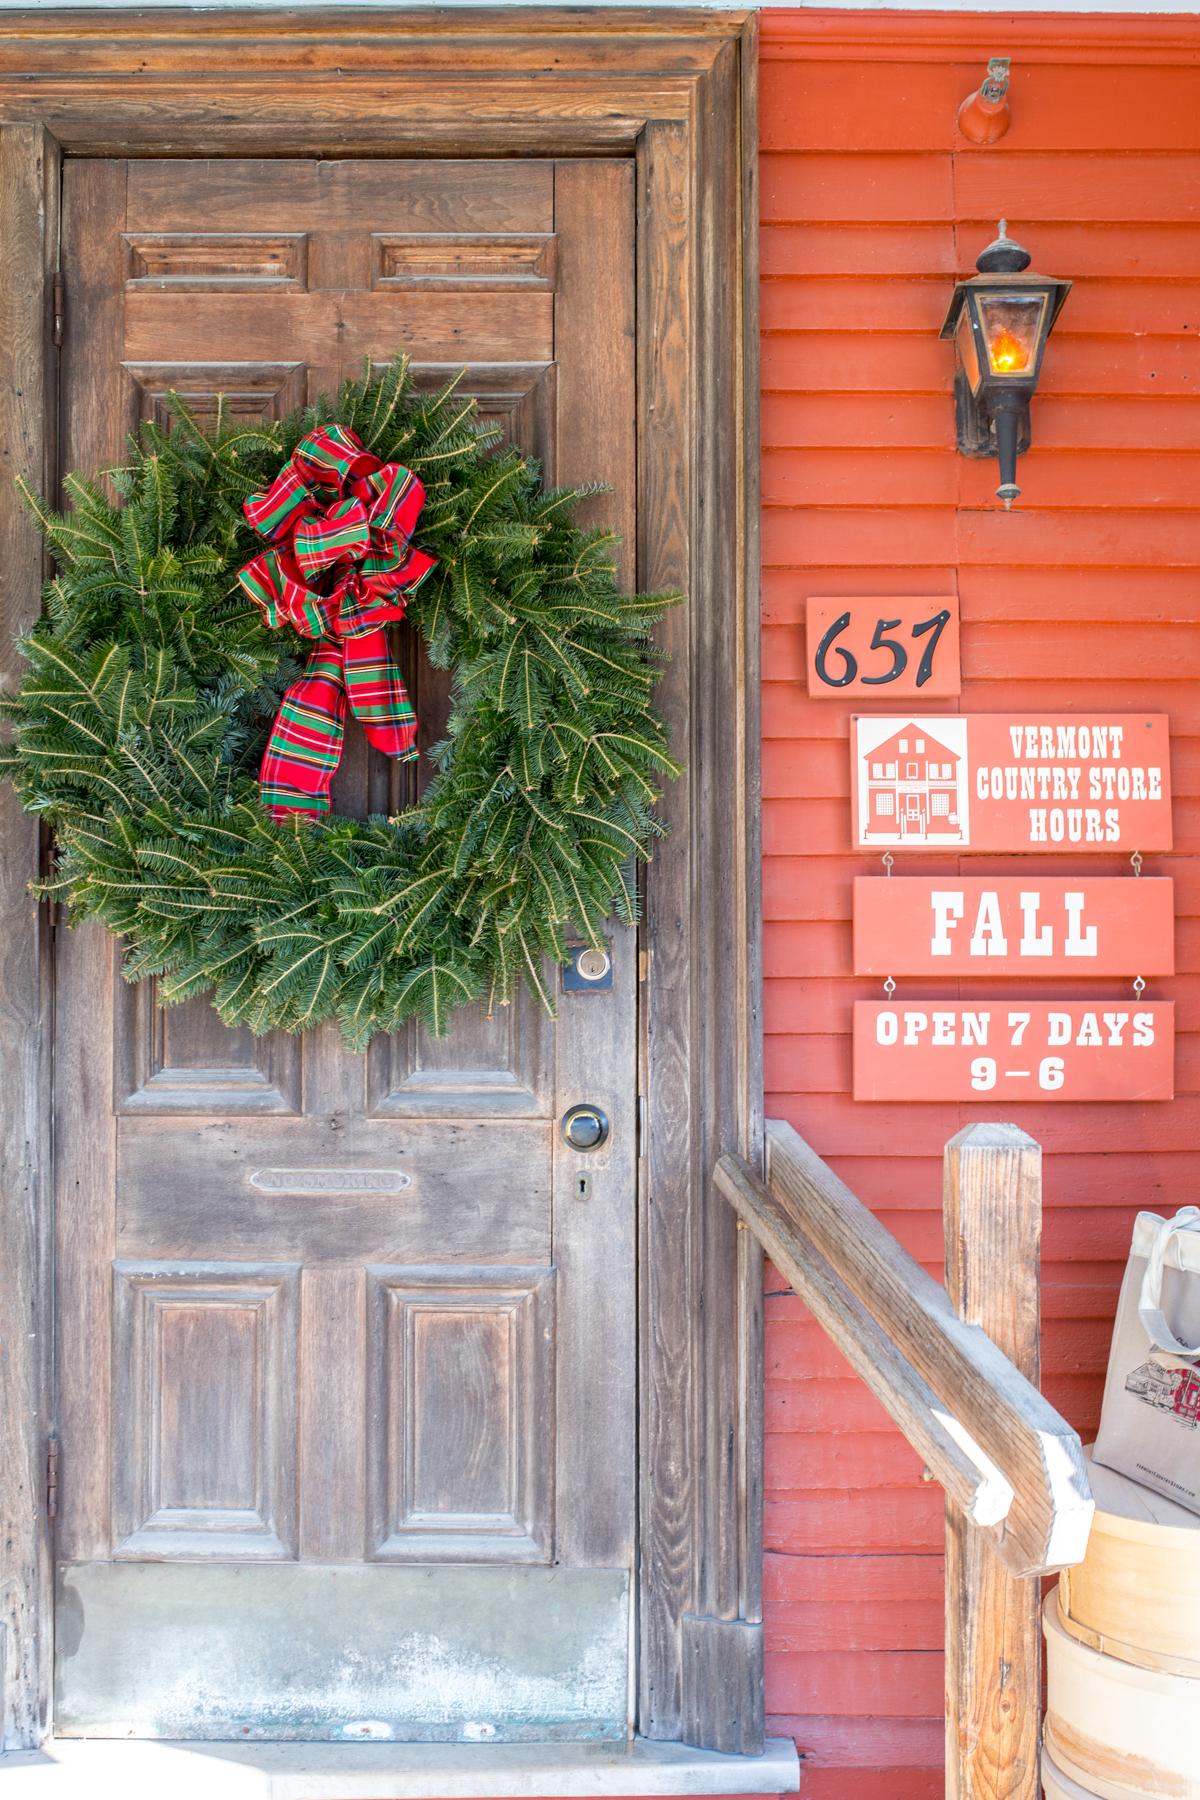 Stacie Flinner x The Pitcher Inn Relais Chateaux Vermont-8.jpg